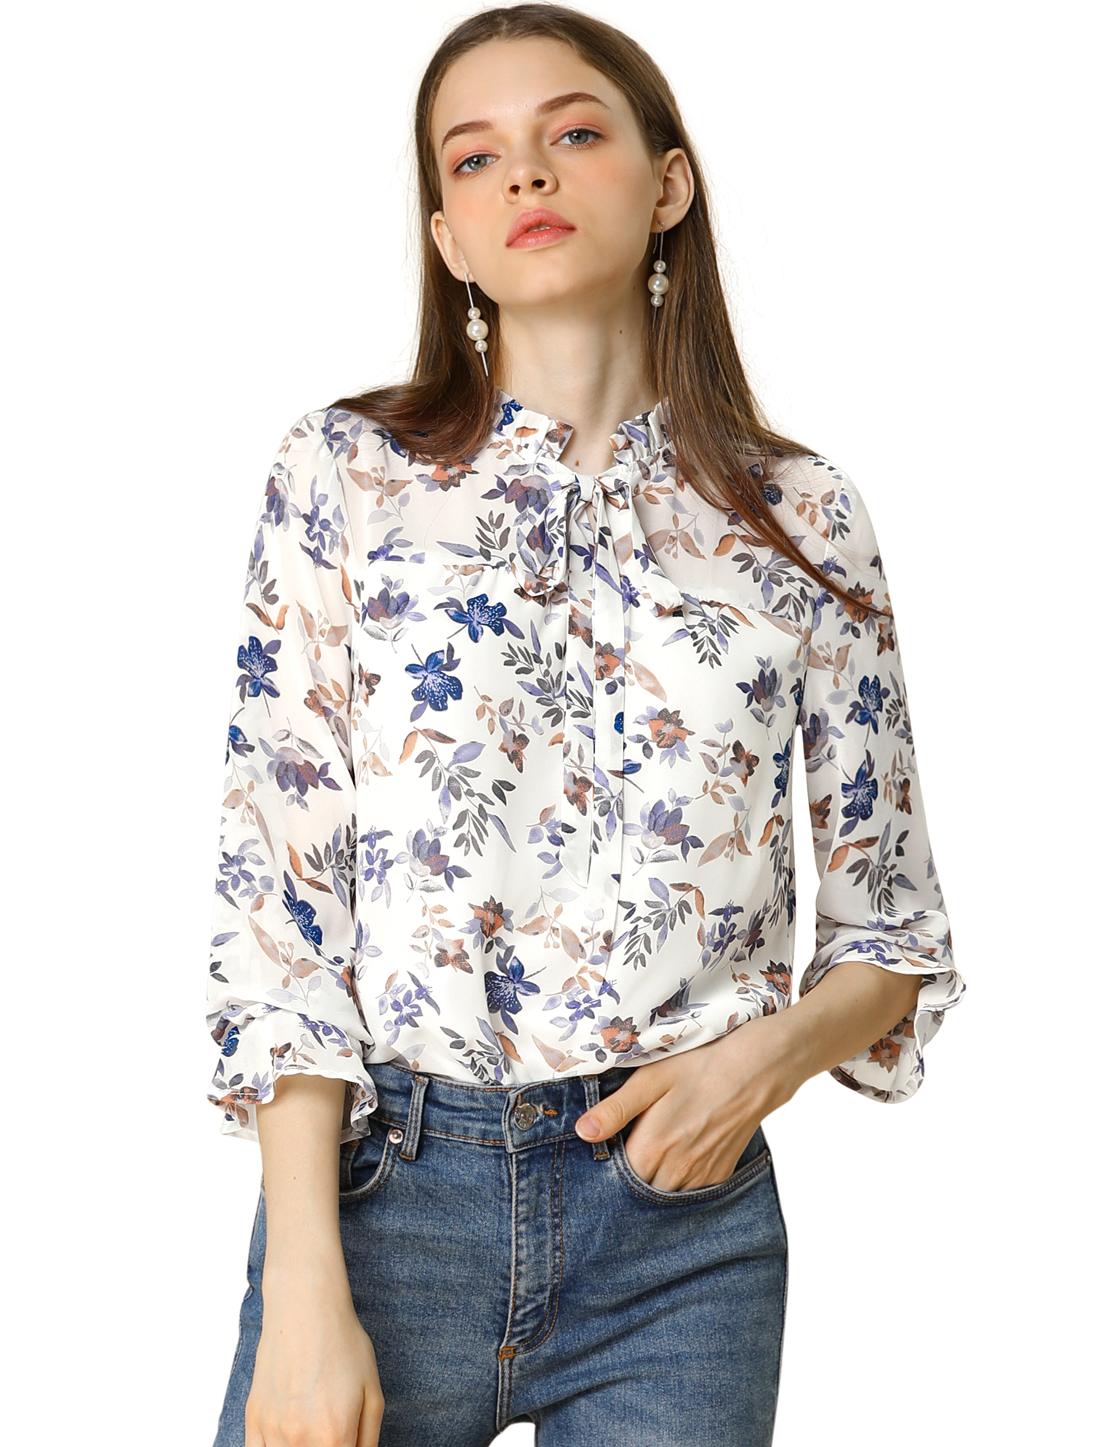 Allegra K Women's Long Sleeve Tie Neck Ruffle Collar Floral Print Top White M